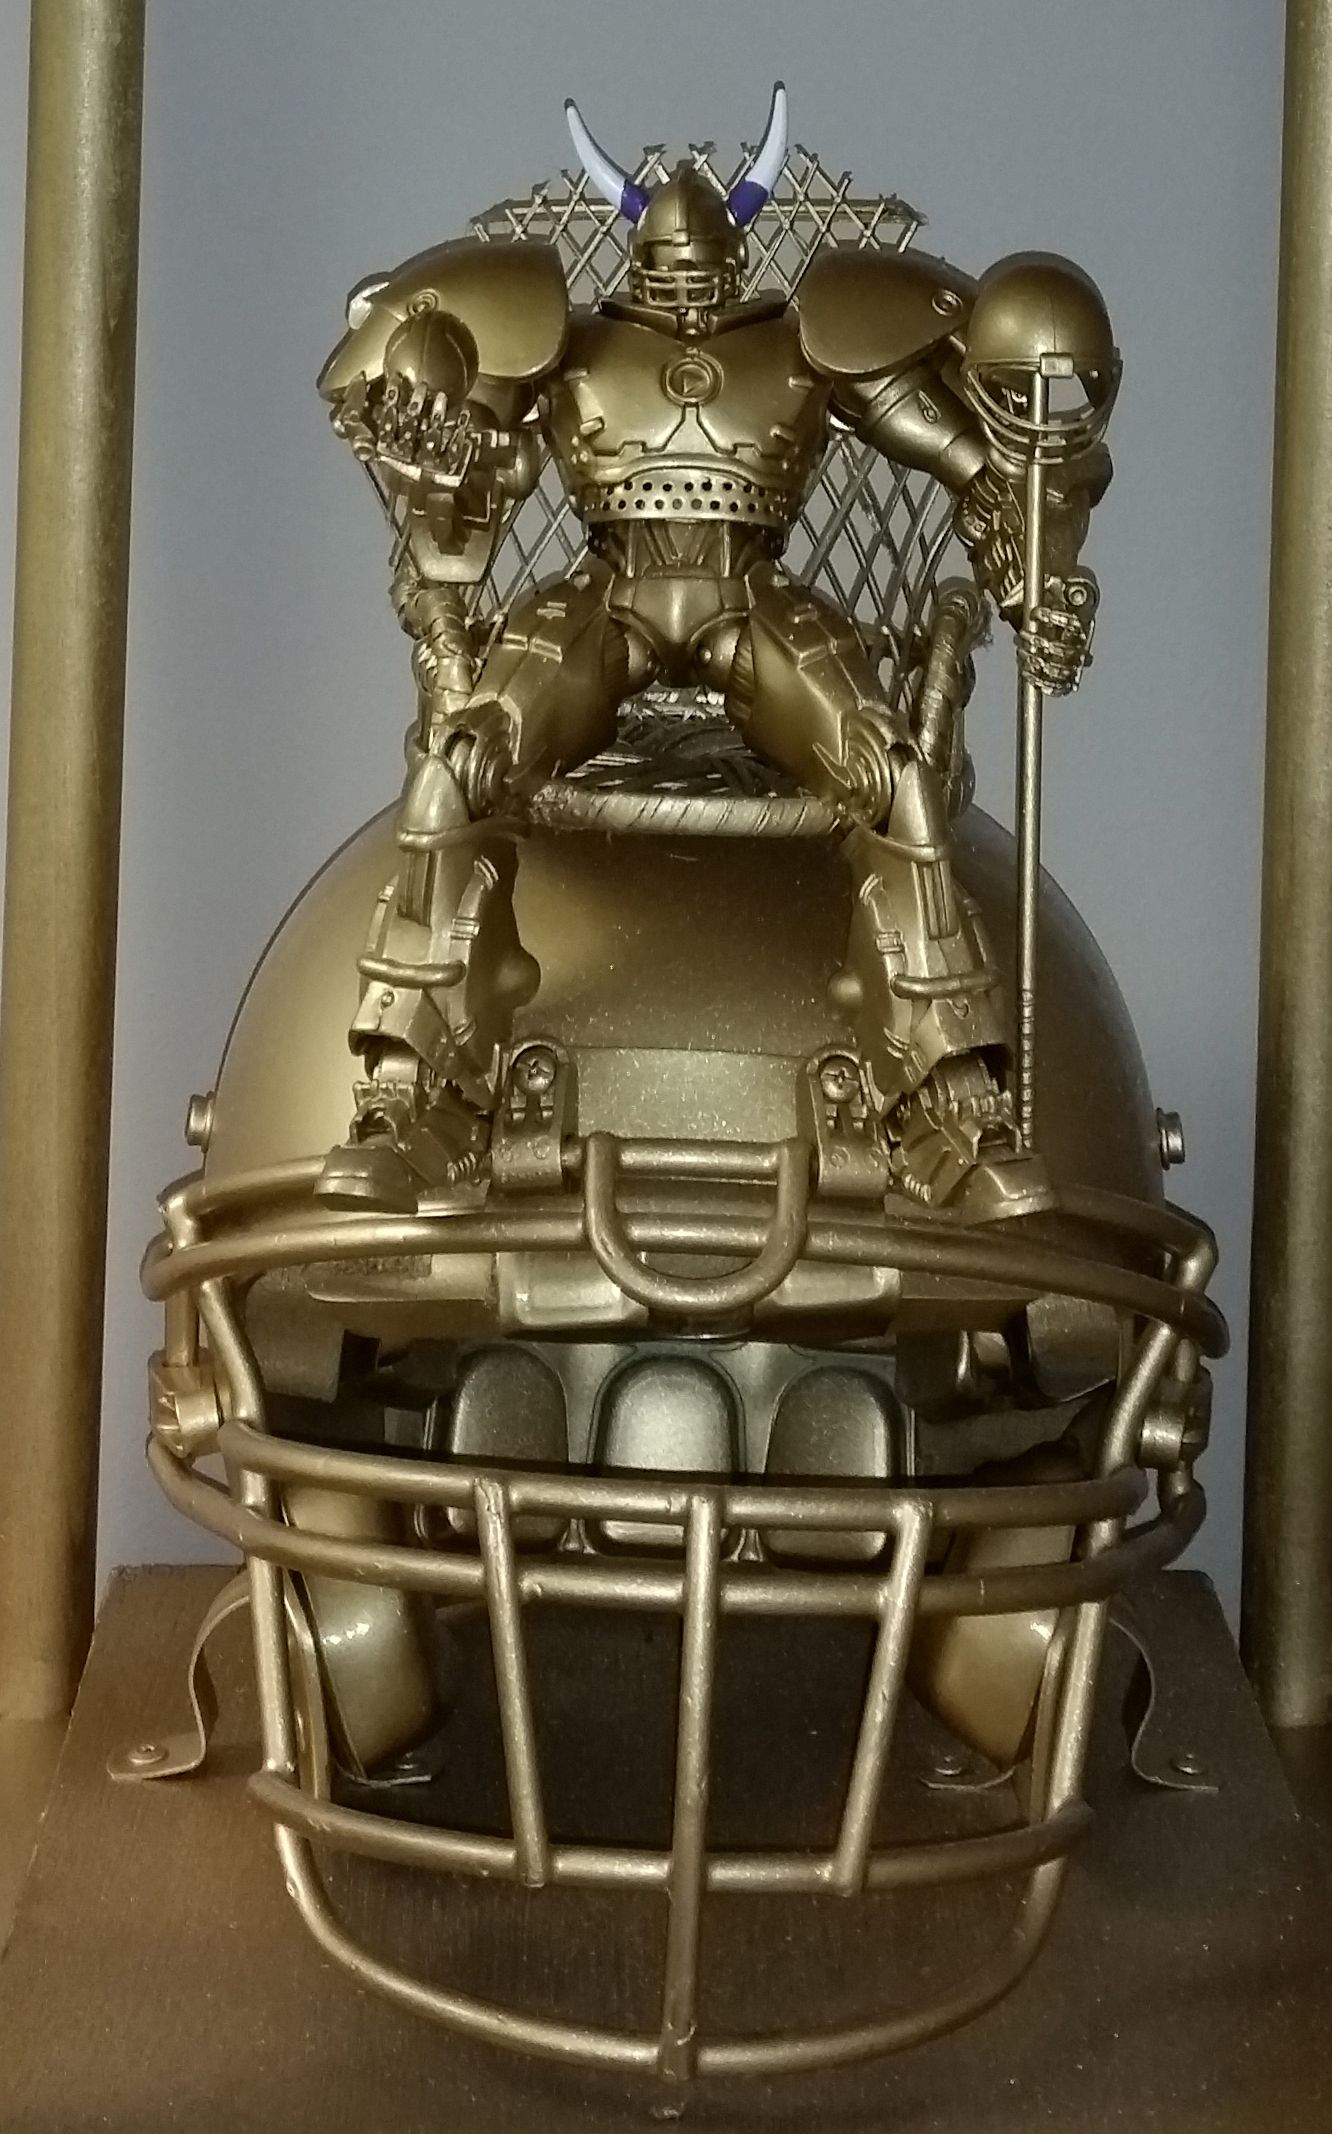 Fantasy football trophy close up shot 2016 nicholas